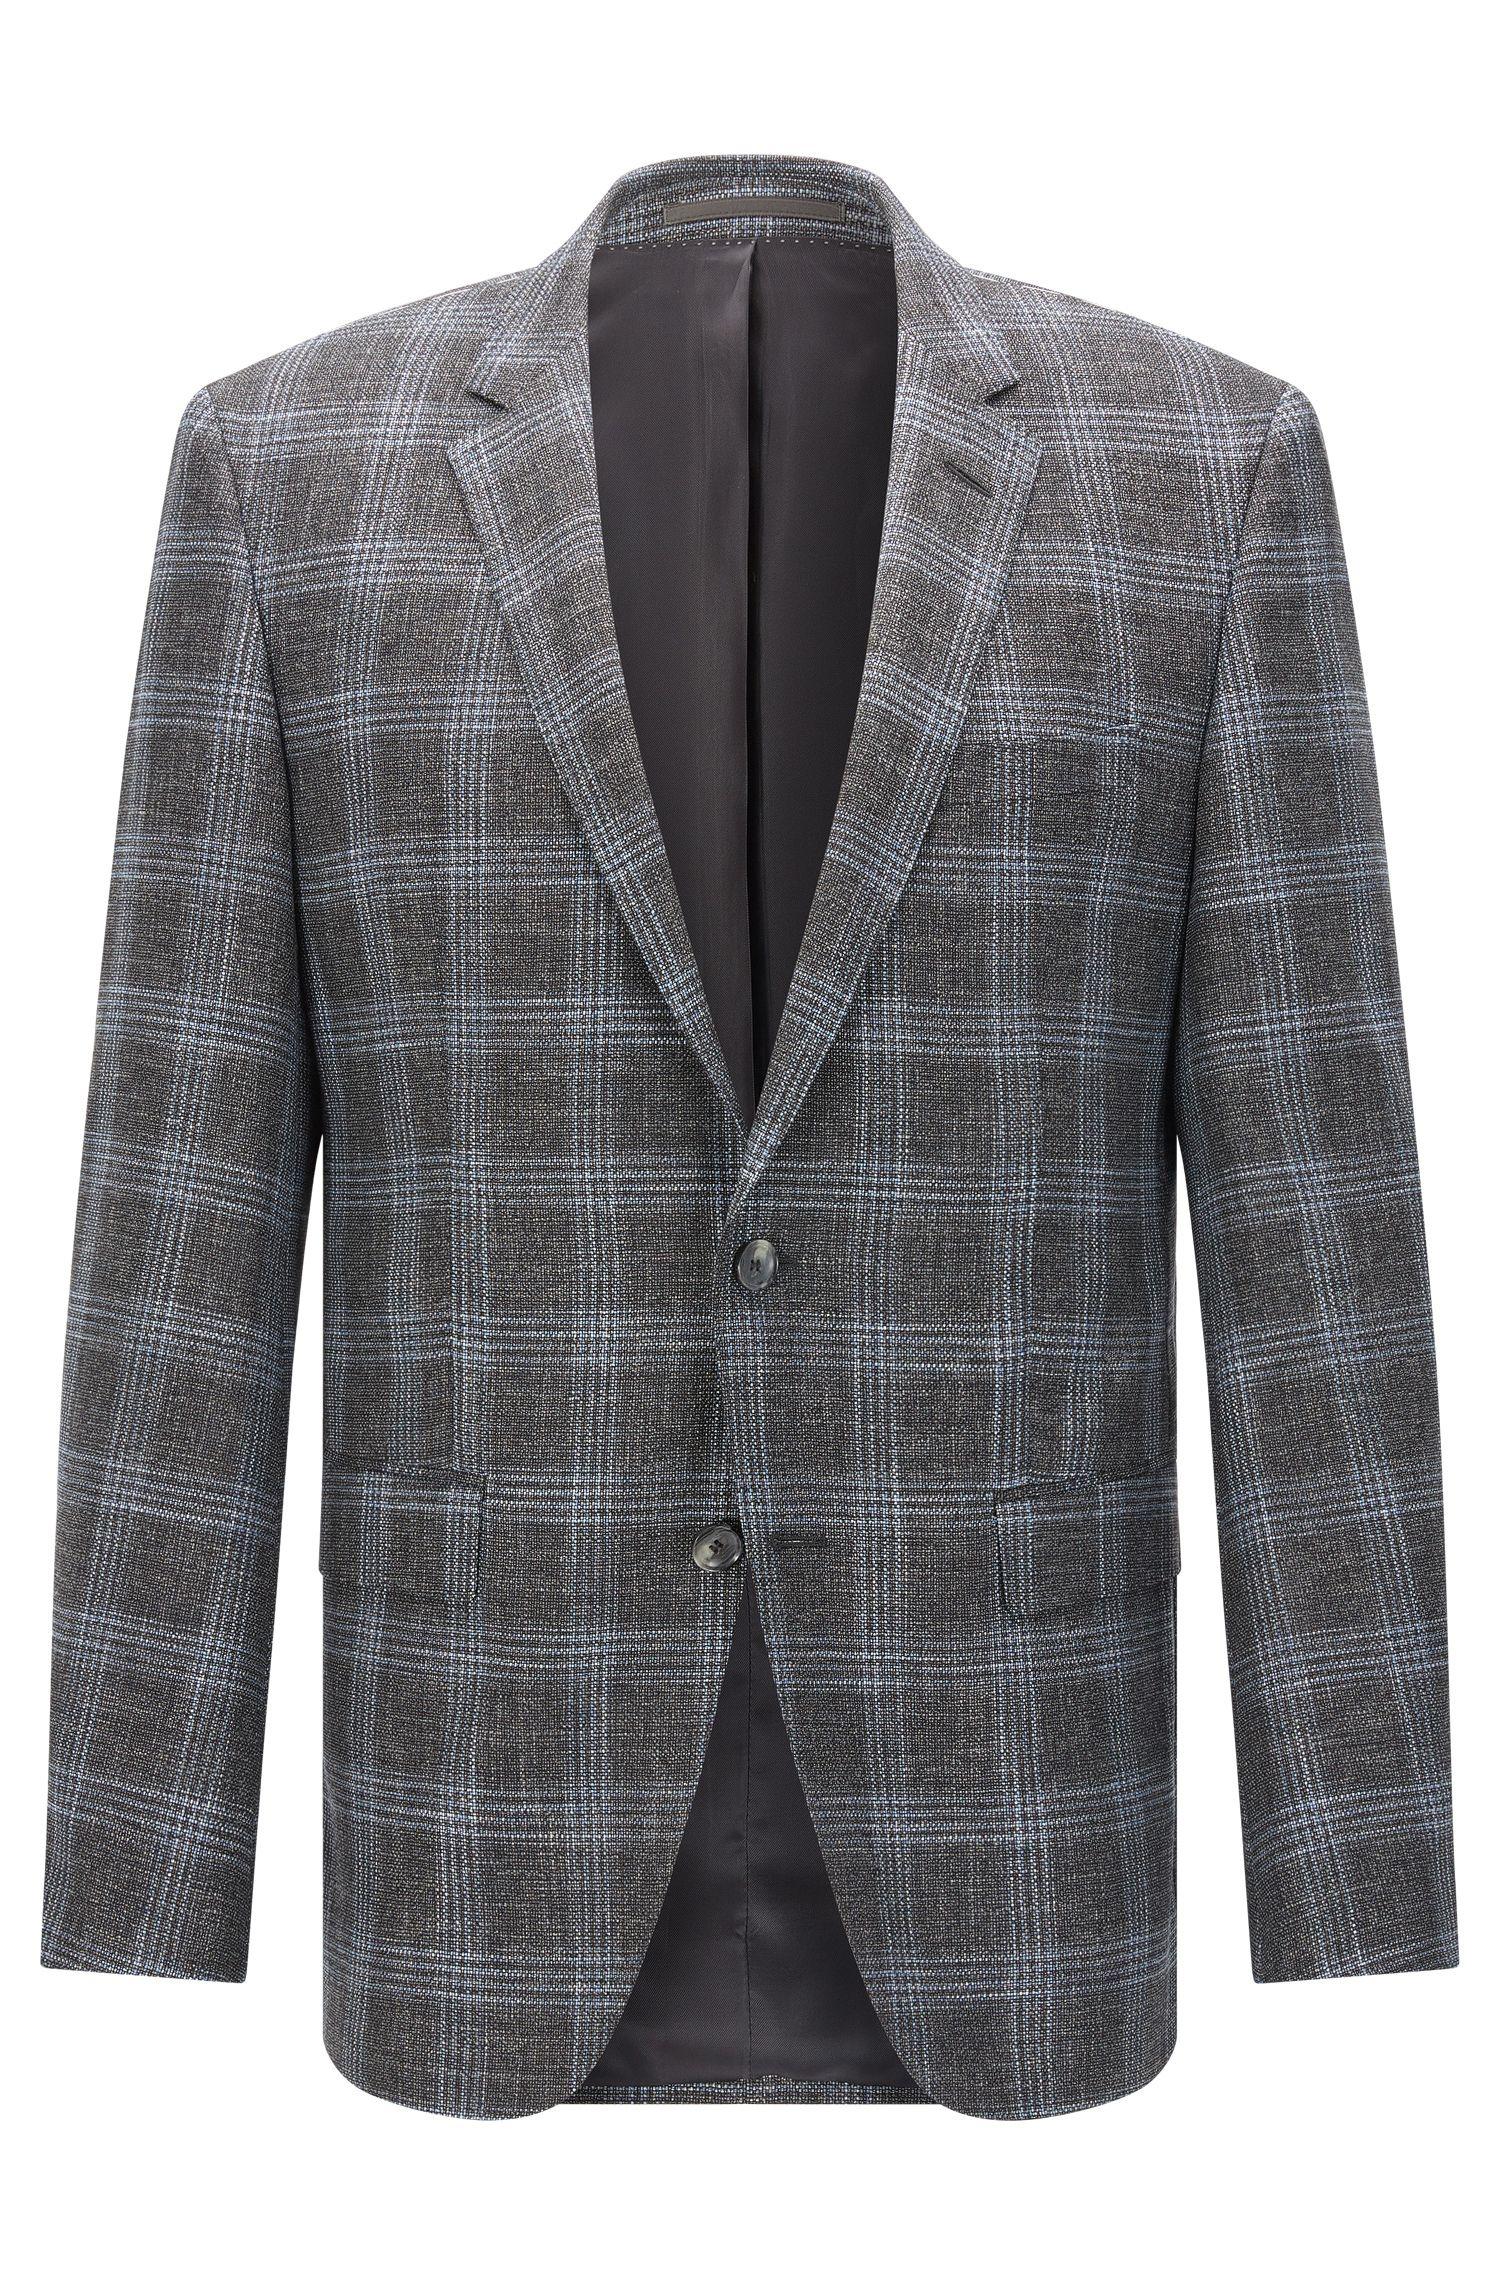 'T-Heel' | Slim Fit, Stretch Virgin Wool Blend Sport Coat